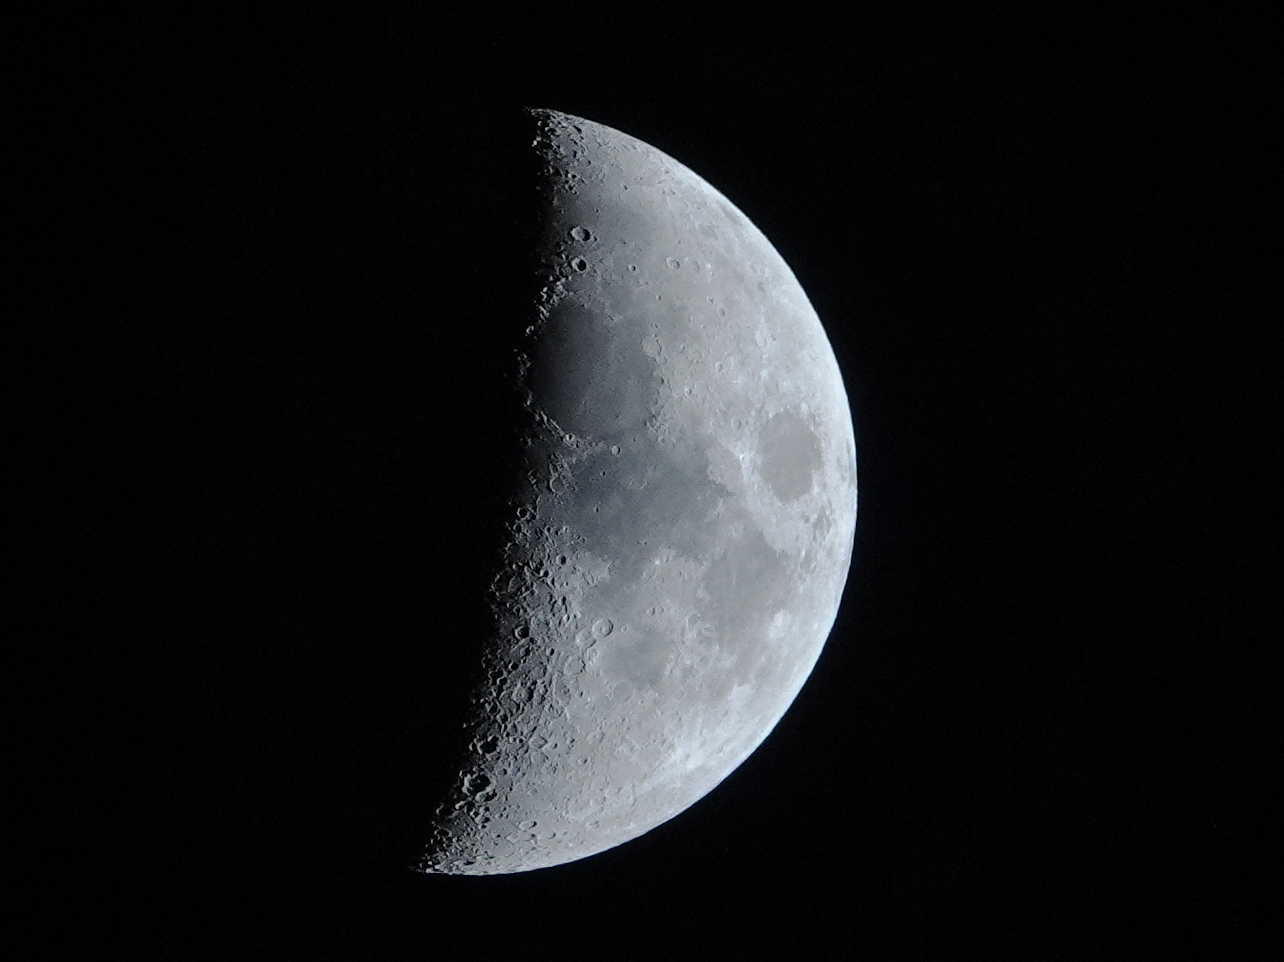 5de6bb126c592_lune3.JPG.ba78f25fa58a5f4f250a98e2b1f5a500.JPG